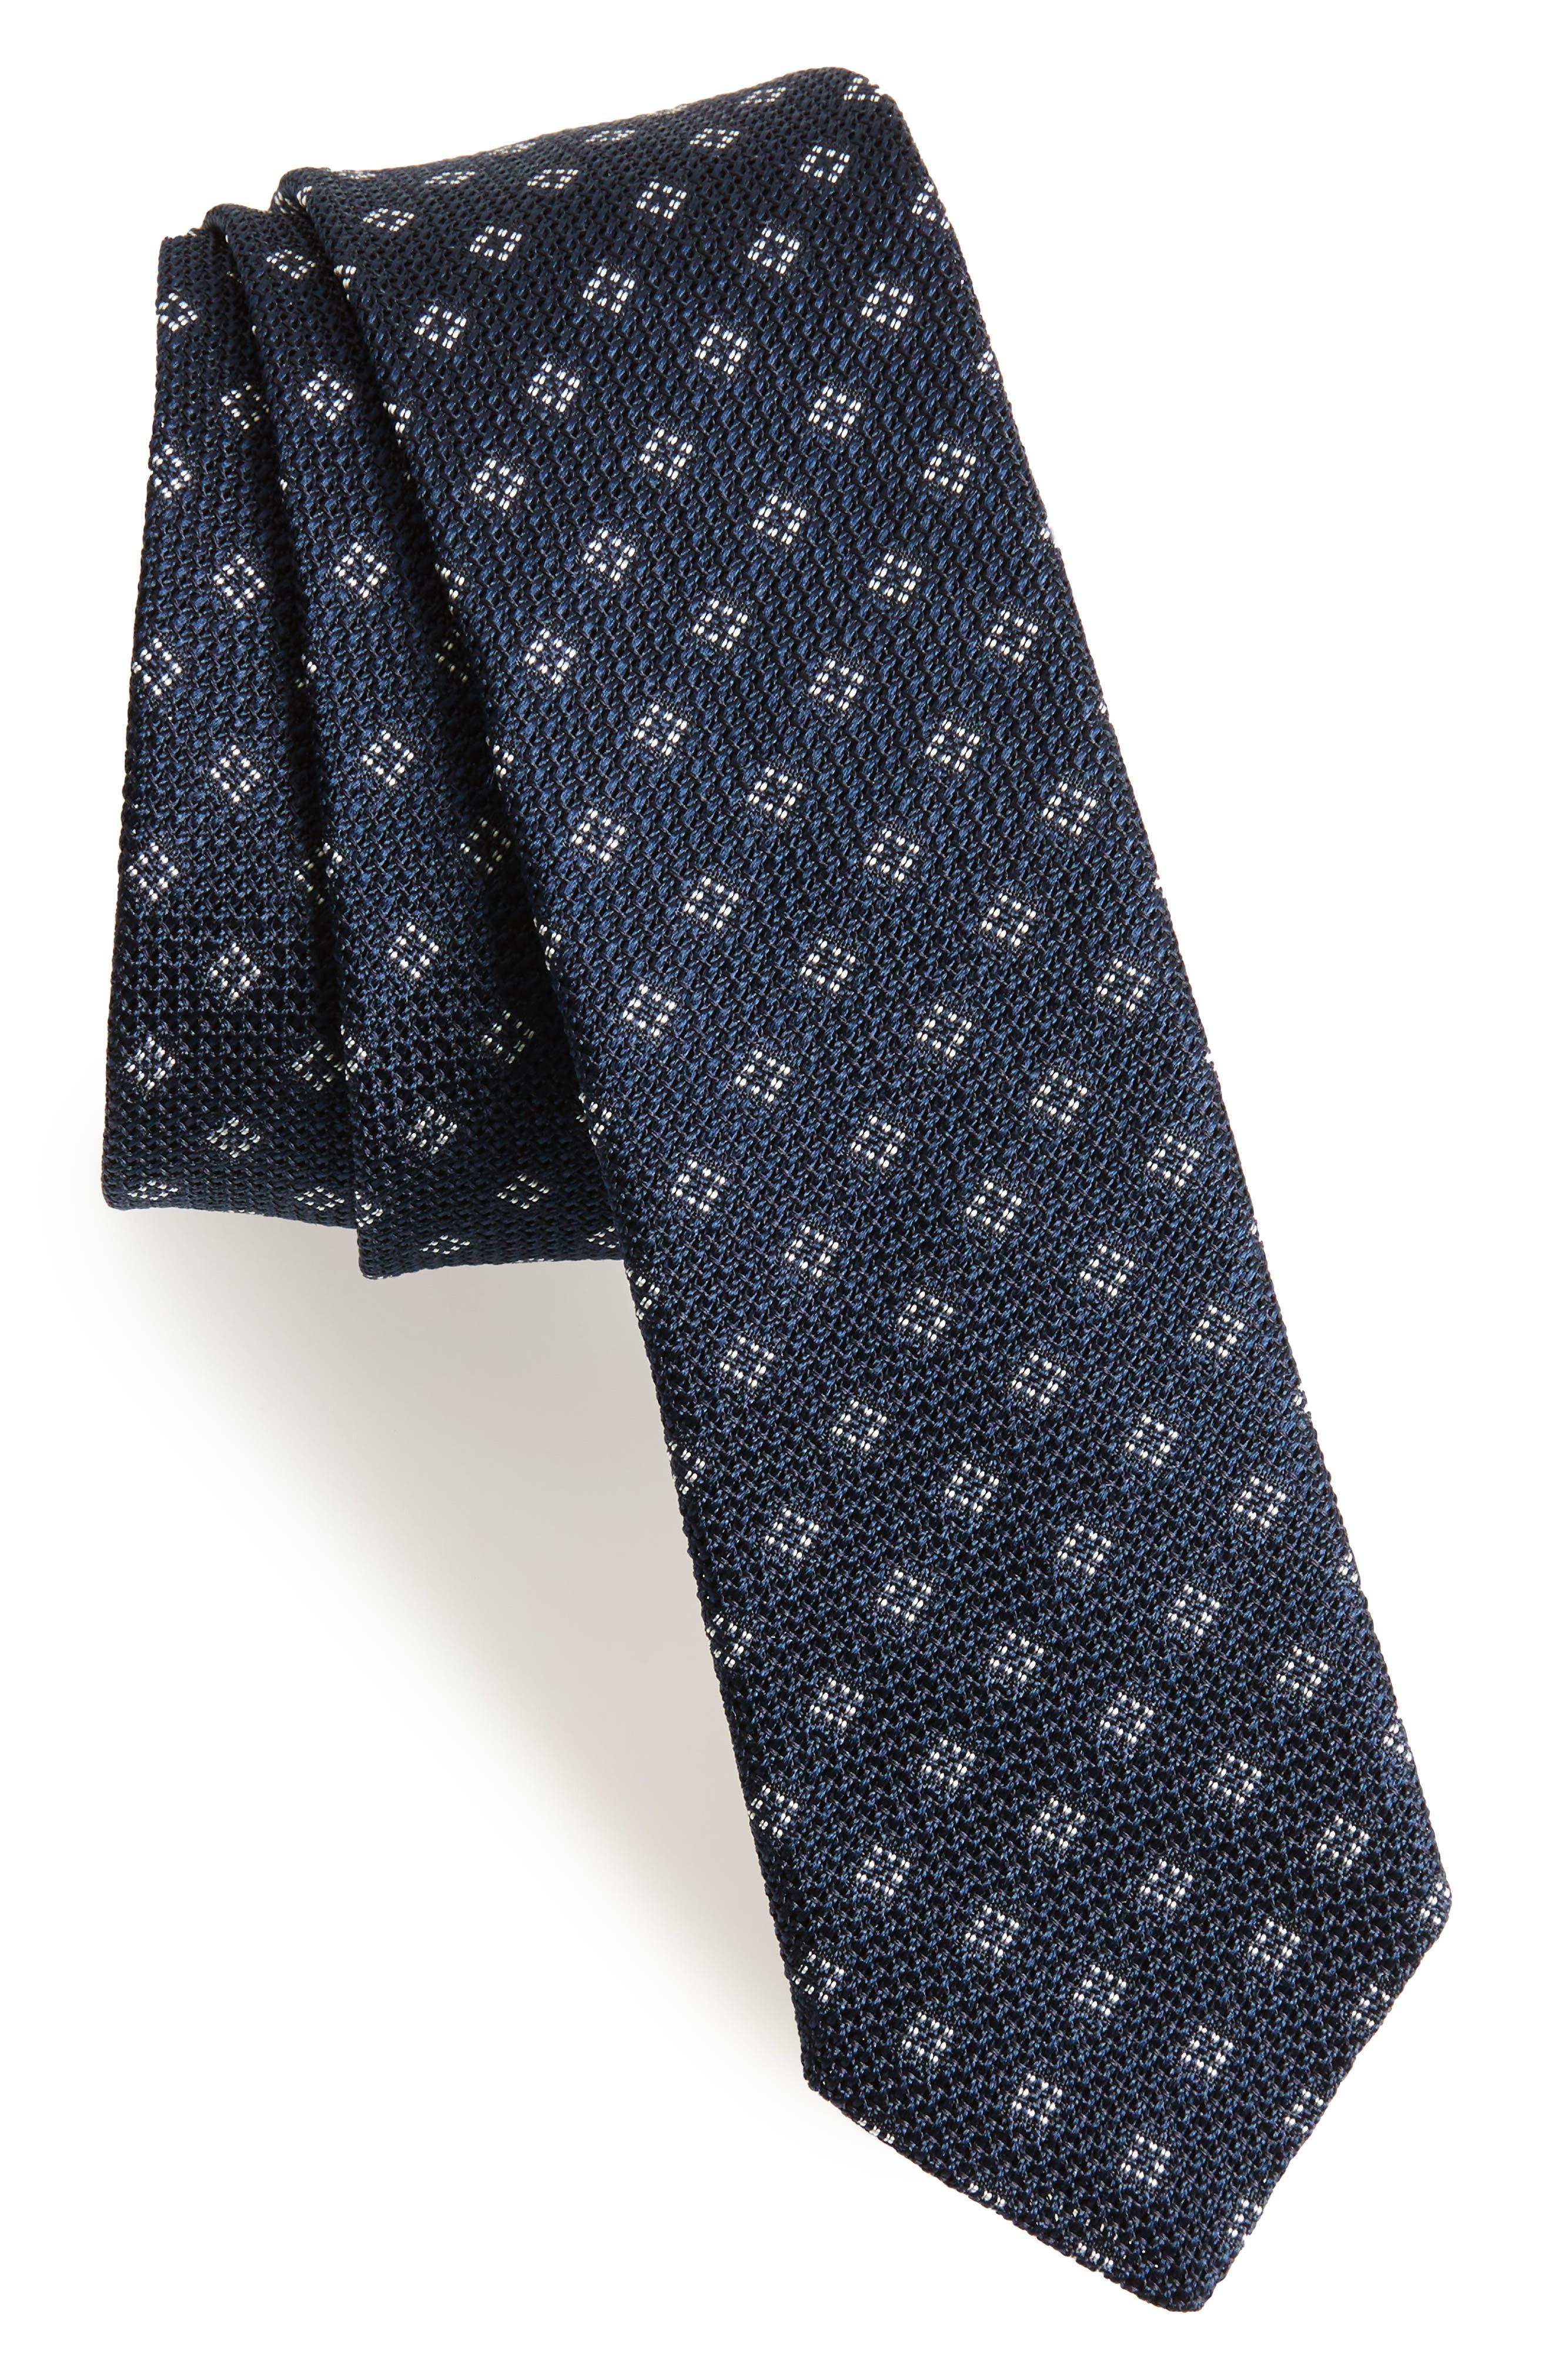 Medallion Silk Skinny Tie,                         Main,                         color, Navy/ White